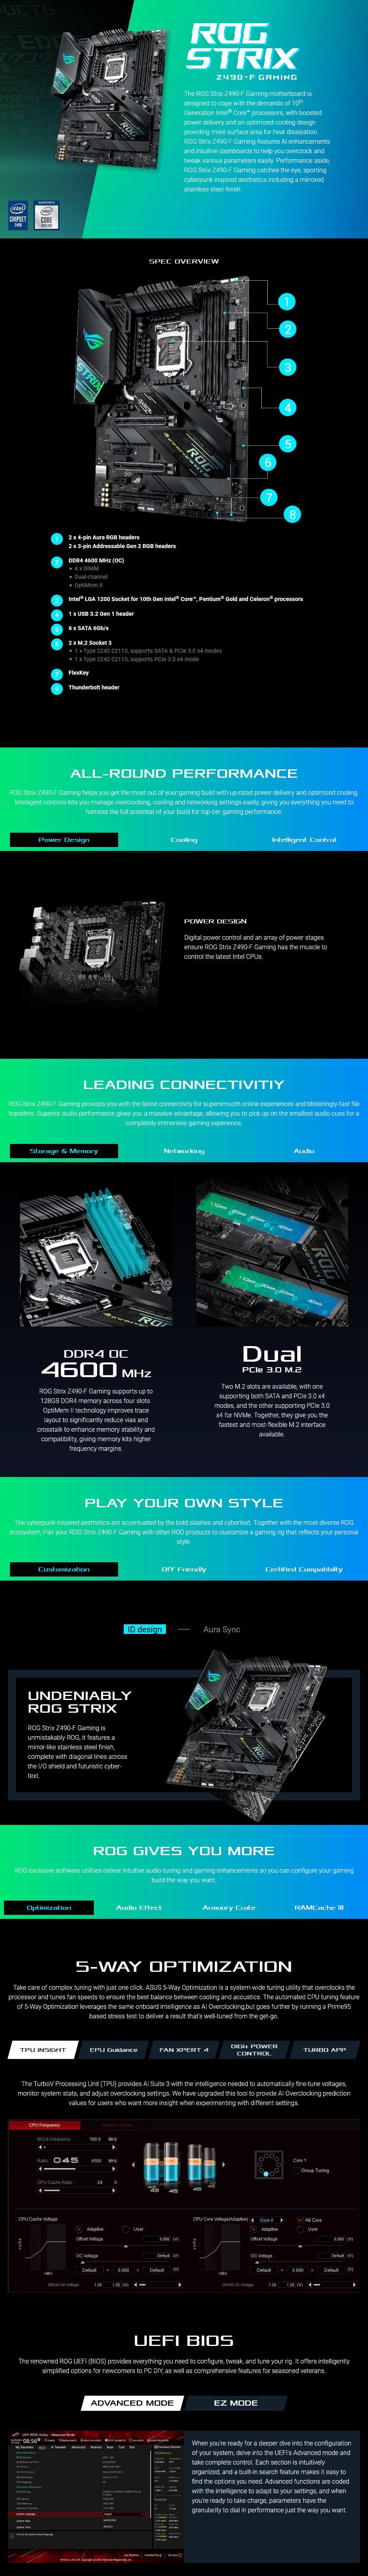 asus-rog-strix-z490f-gaming-lga-1200-atx-motherboard-ac34476-9.jpg